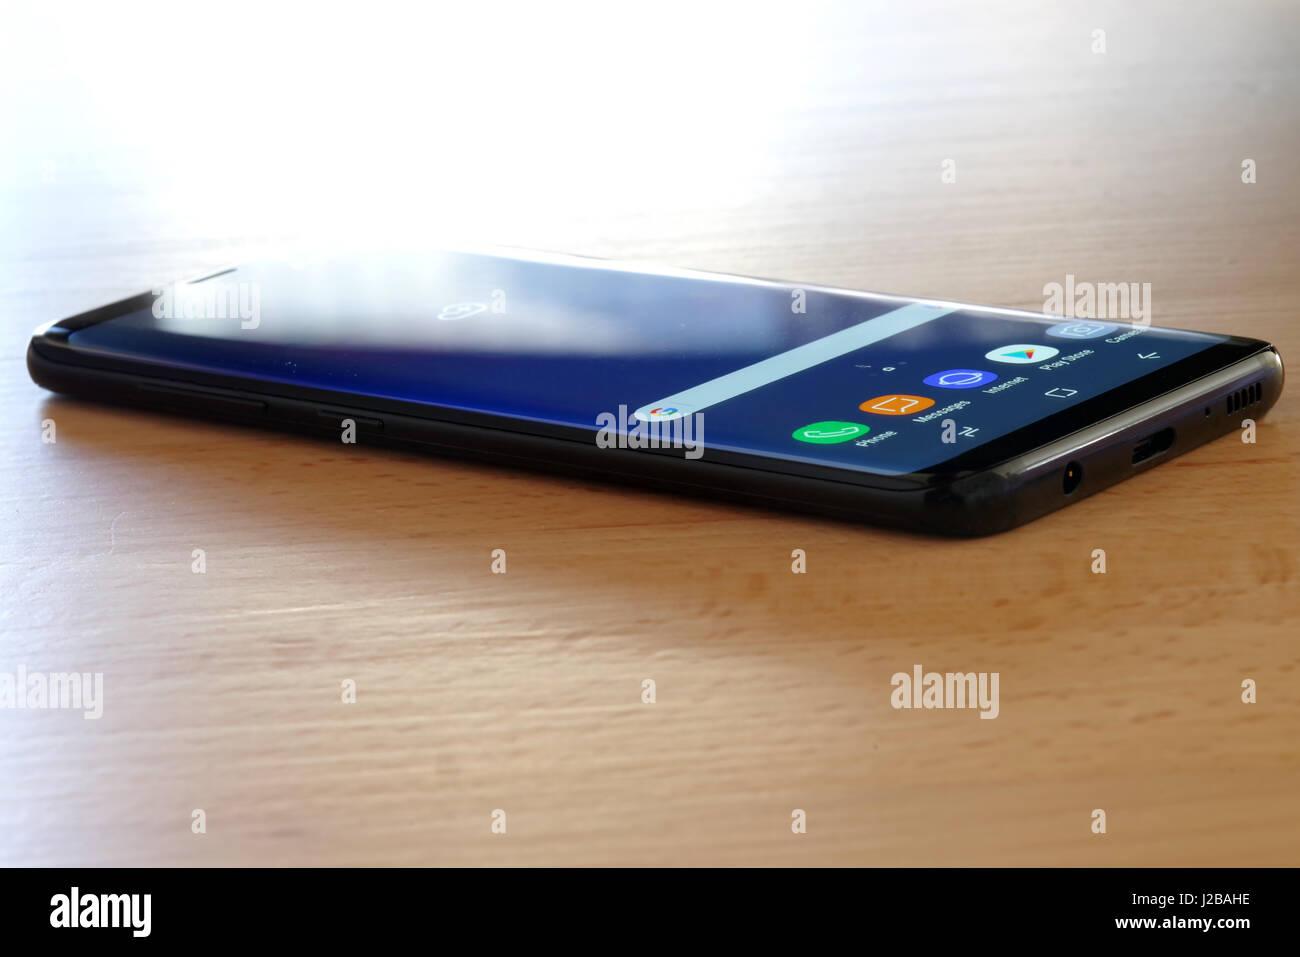 Koszalin, Poland - 27 April, 2017: Black Samsung Galaxy S8 on wooden table. Samsung S8 are new generation smartphone - Stock Image